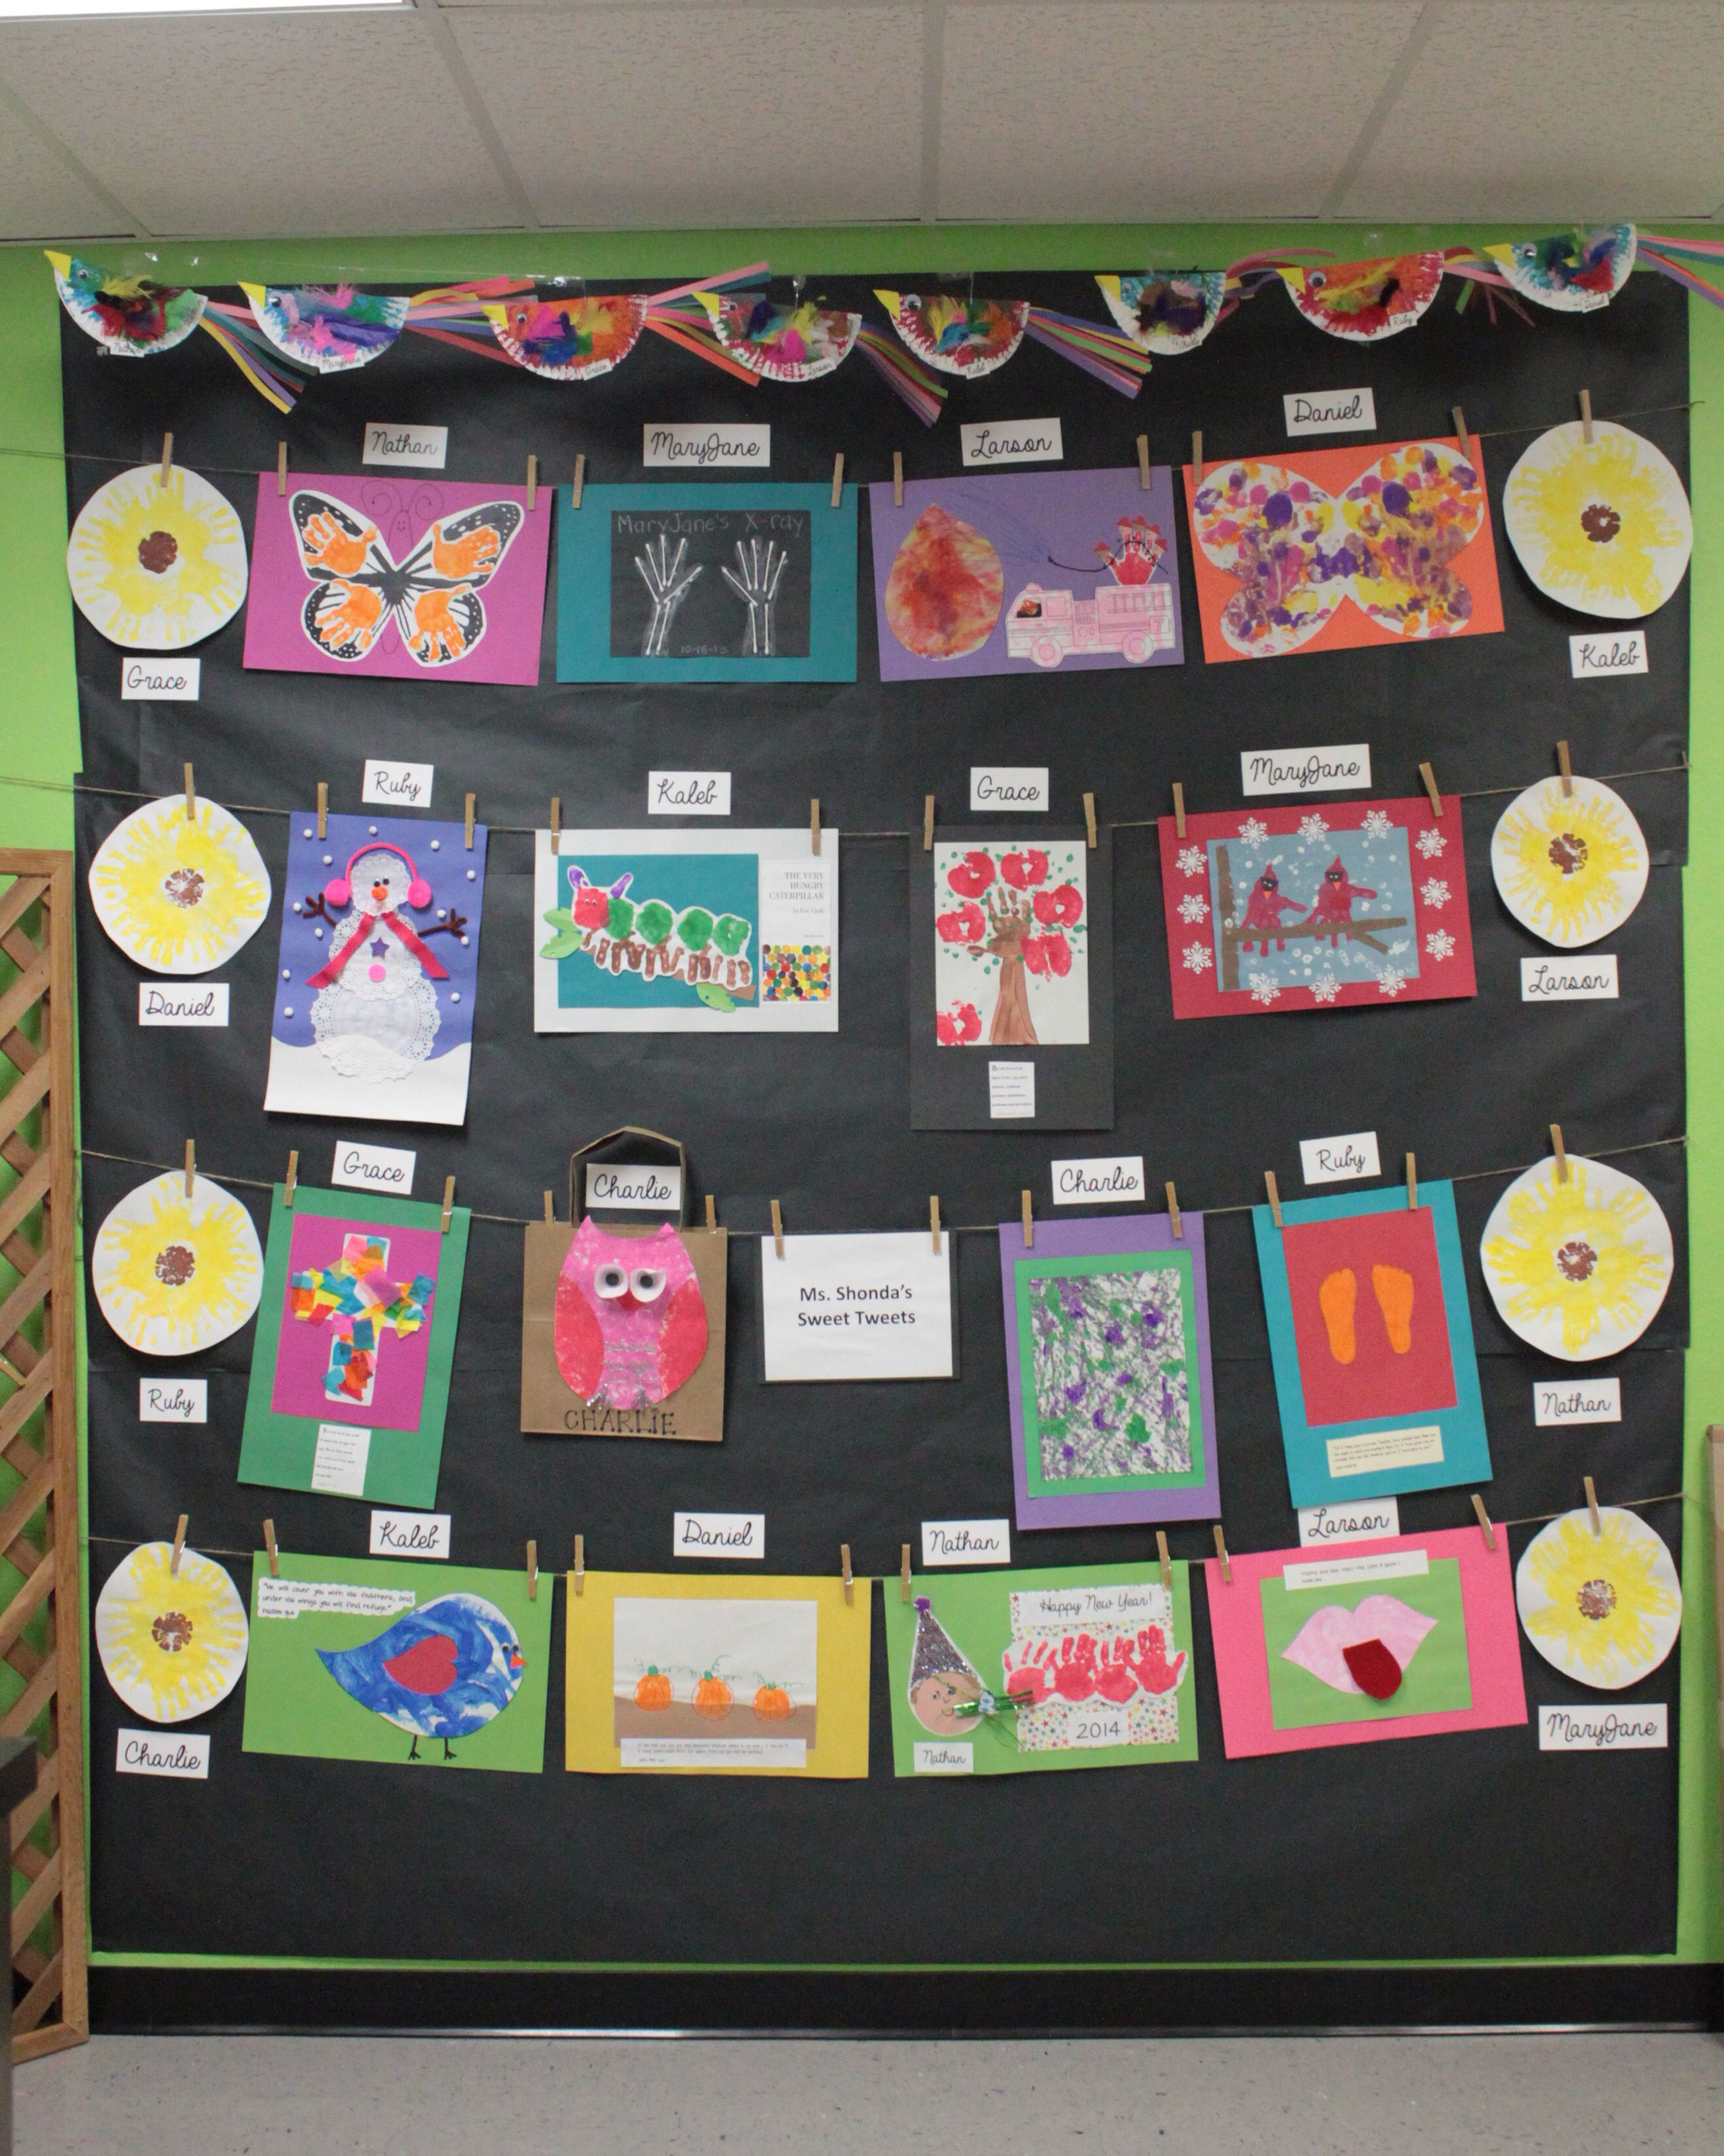 Preschool Art Show Display 2014 Personal Projects